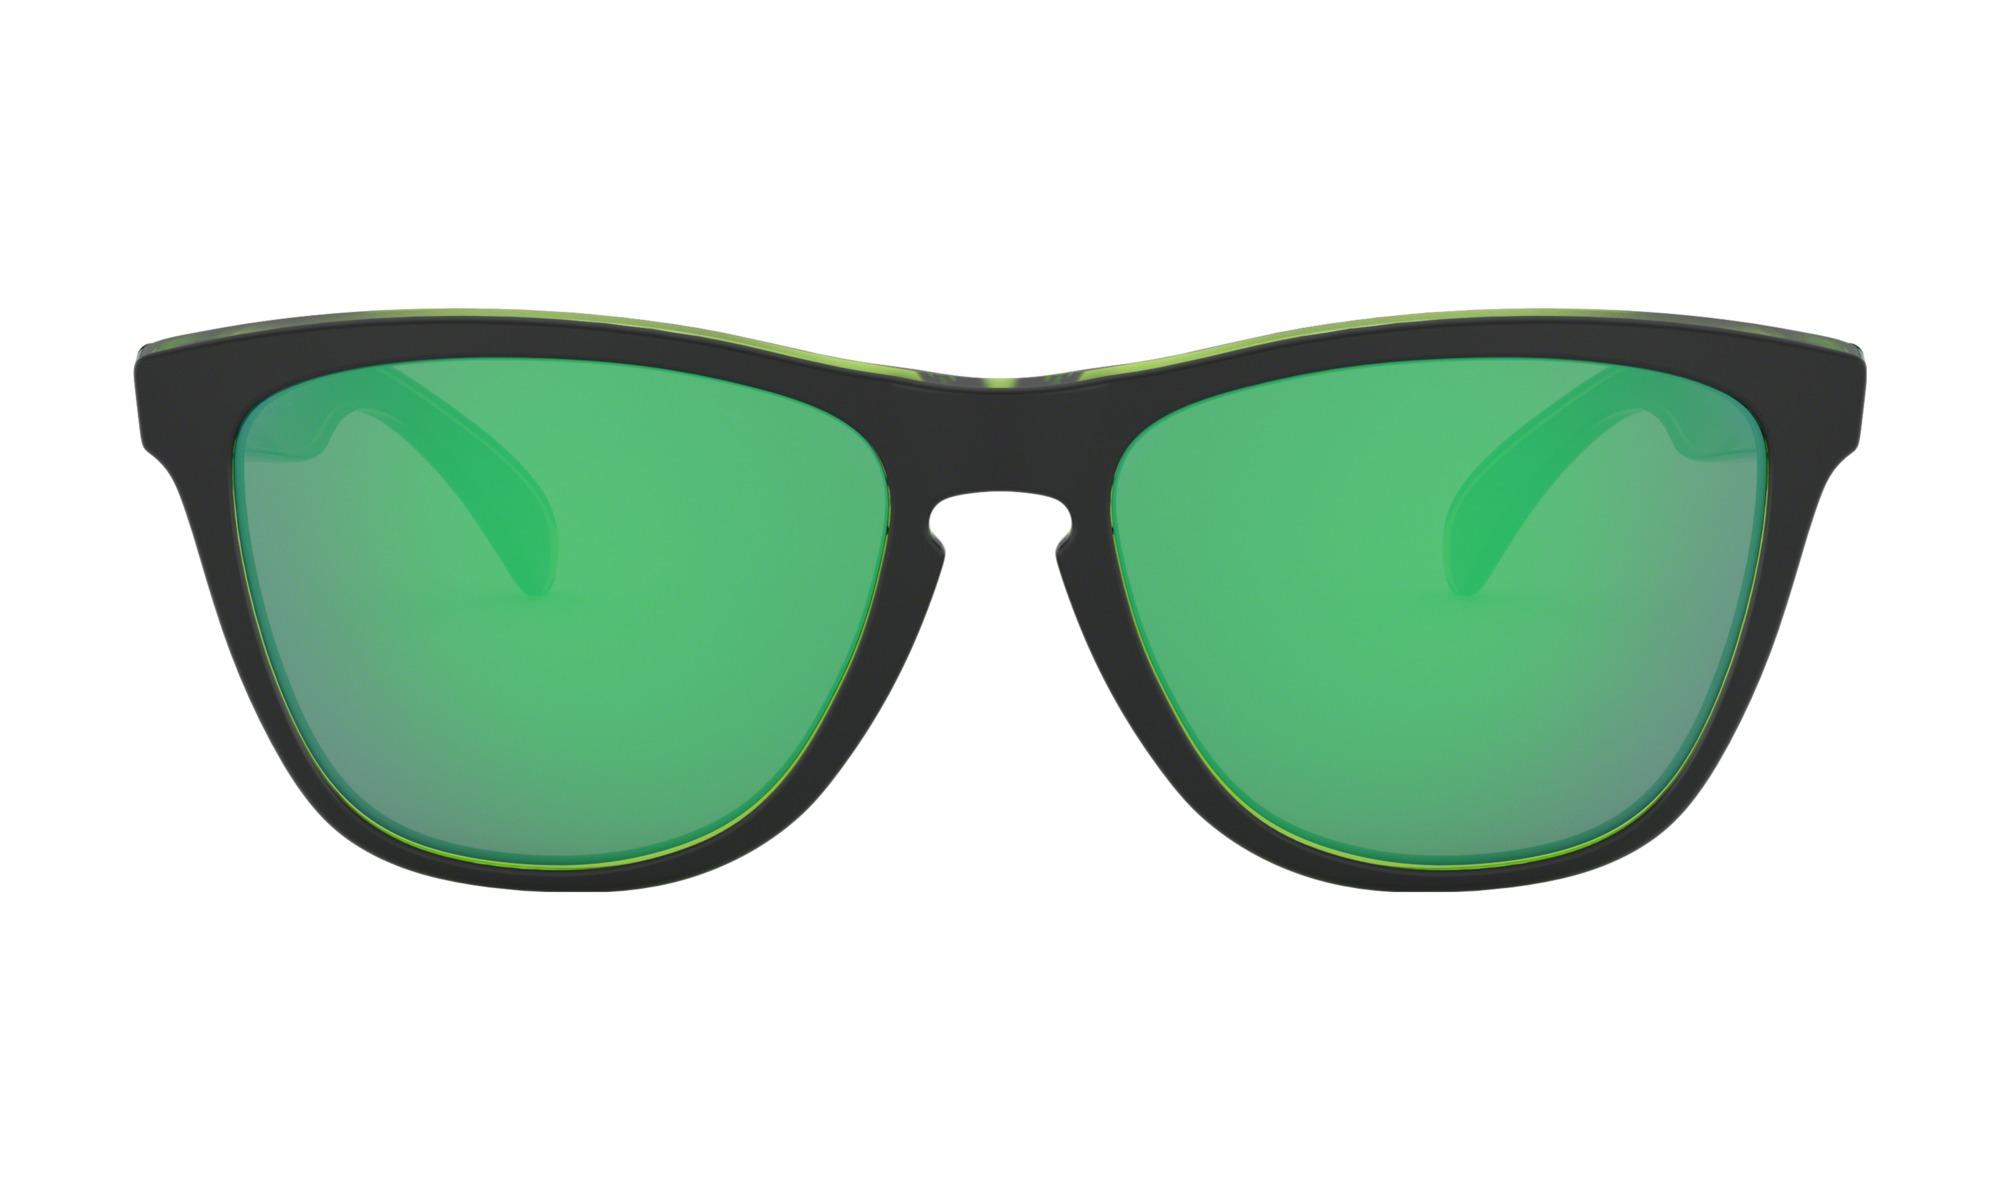 main_oo9013-a8_frogskins_eclipse-green-jade-iridium_010_119171_png_heroxl_ergovision